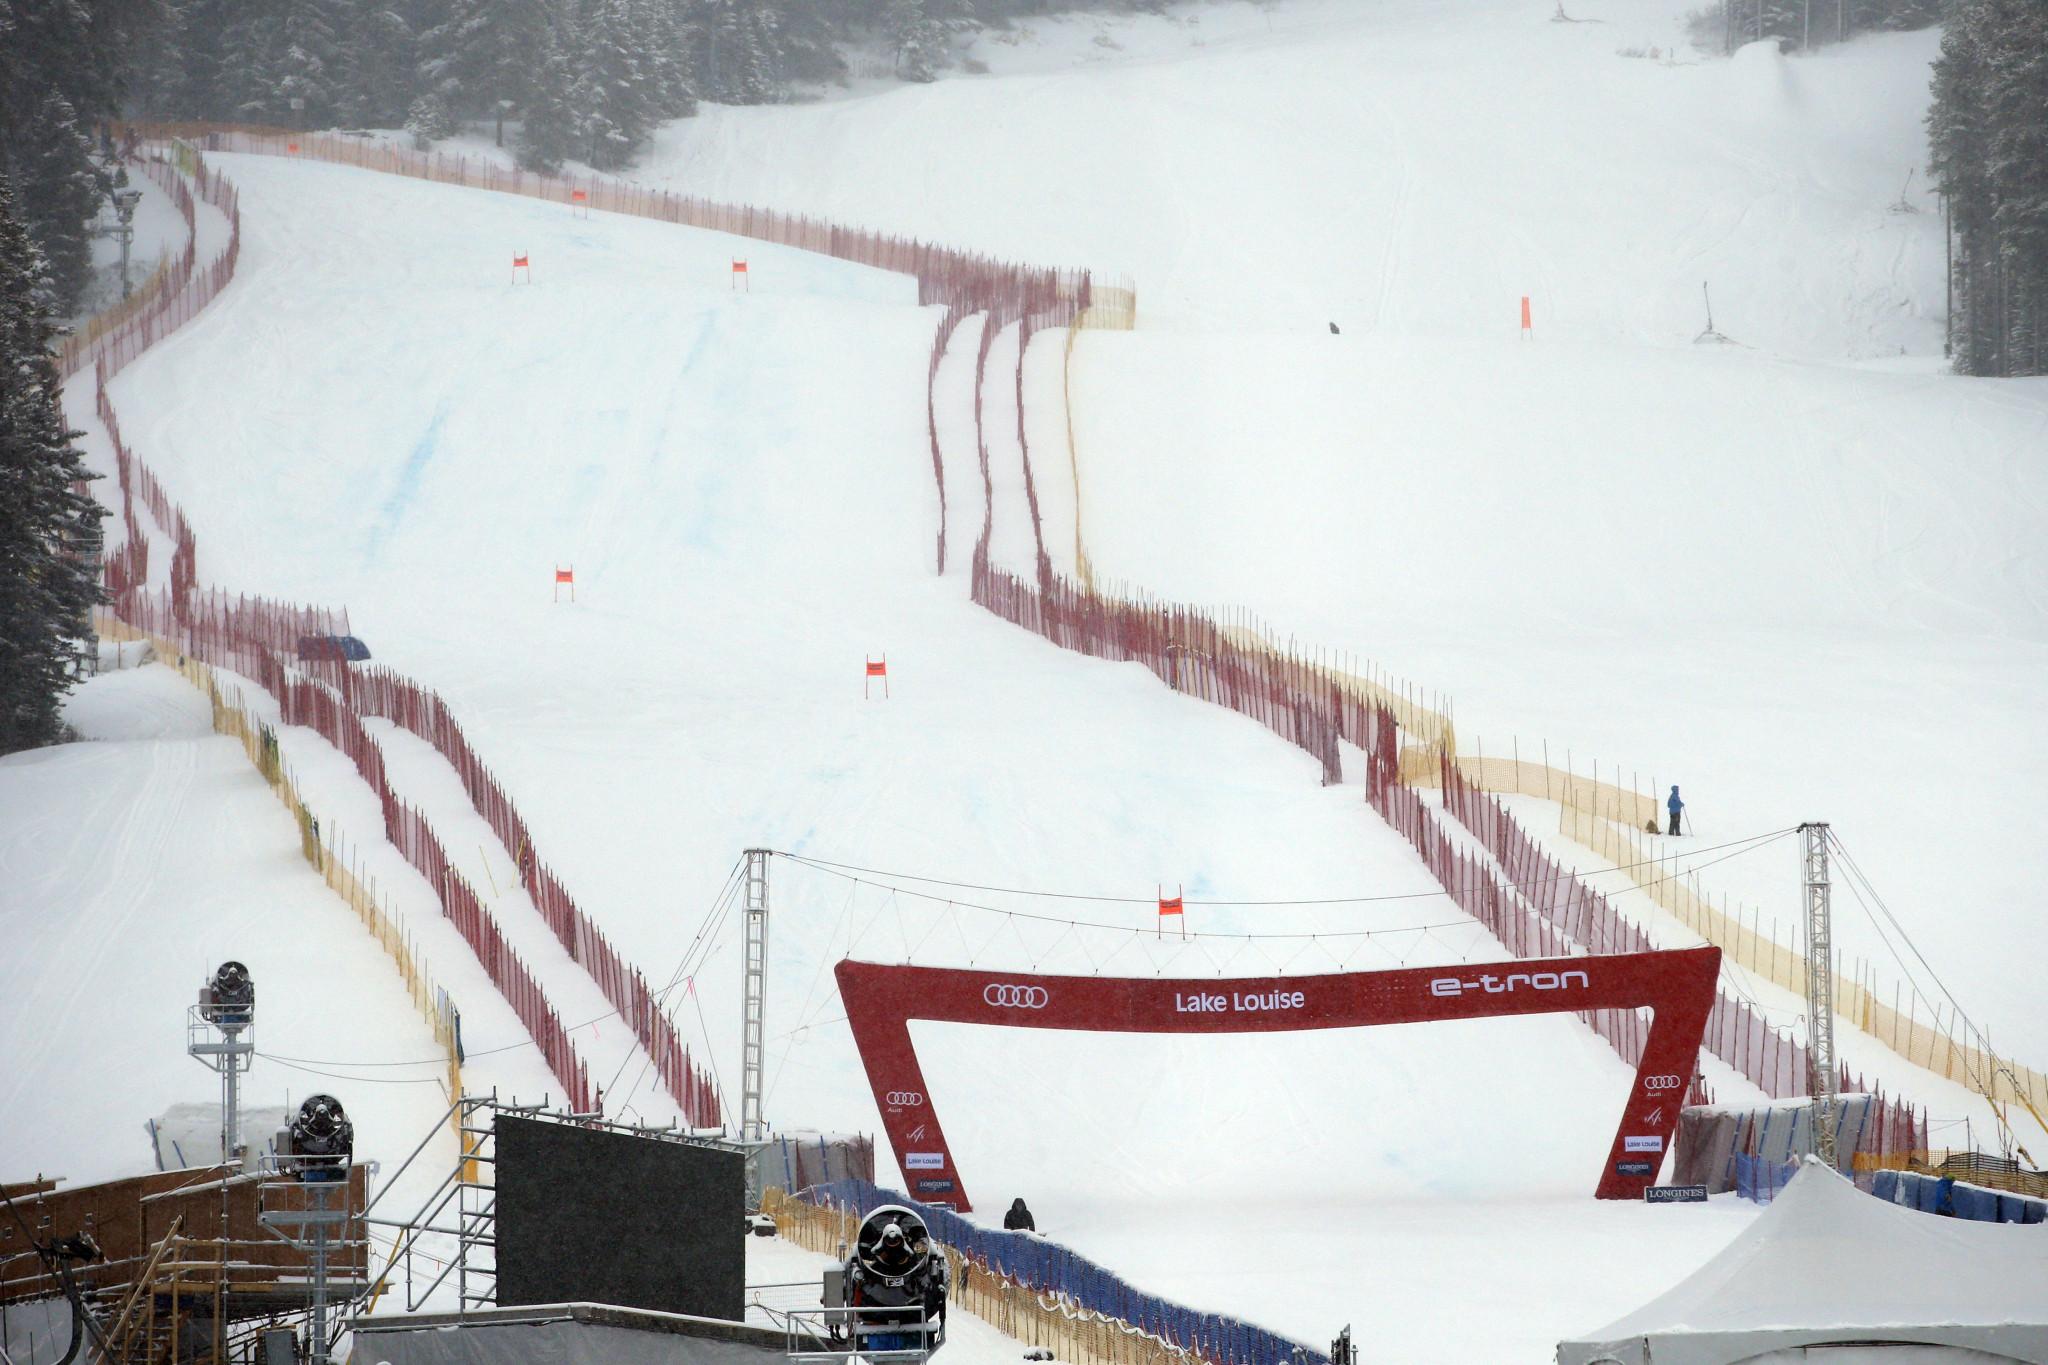 Women's FIS Alpine Ski World Cup season continues in Lake Louise